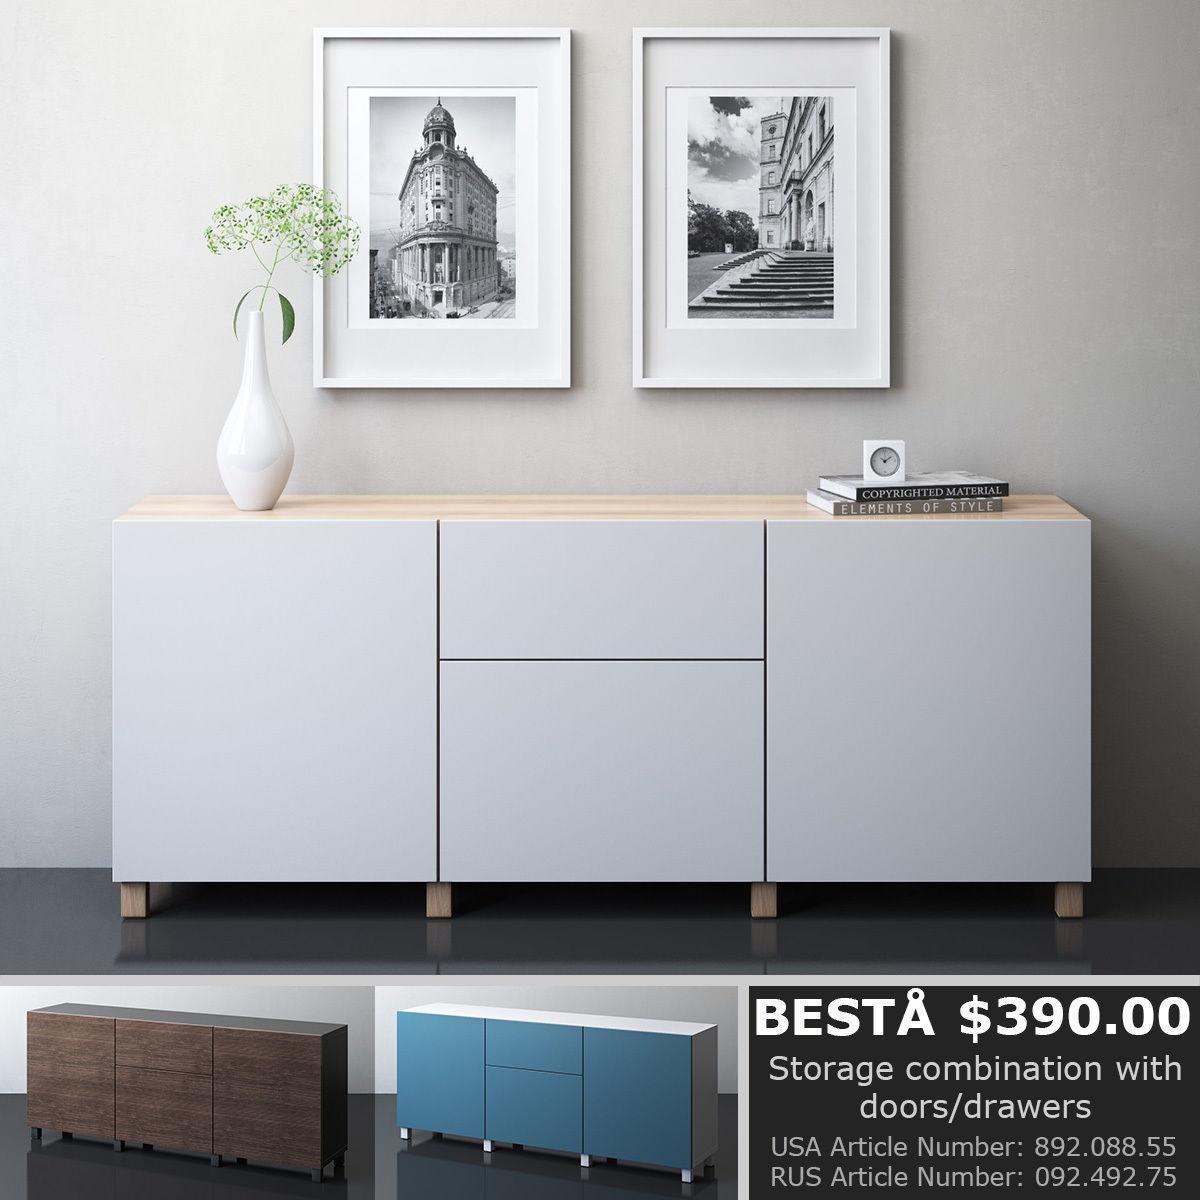 3D IKEA BESTA Storage Combination